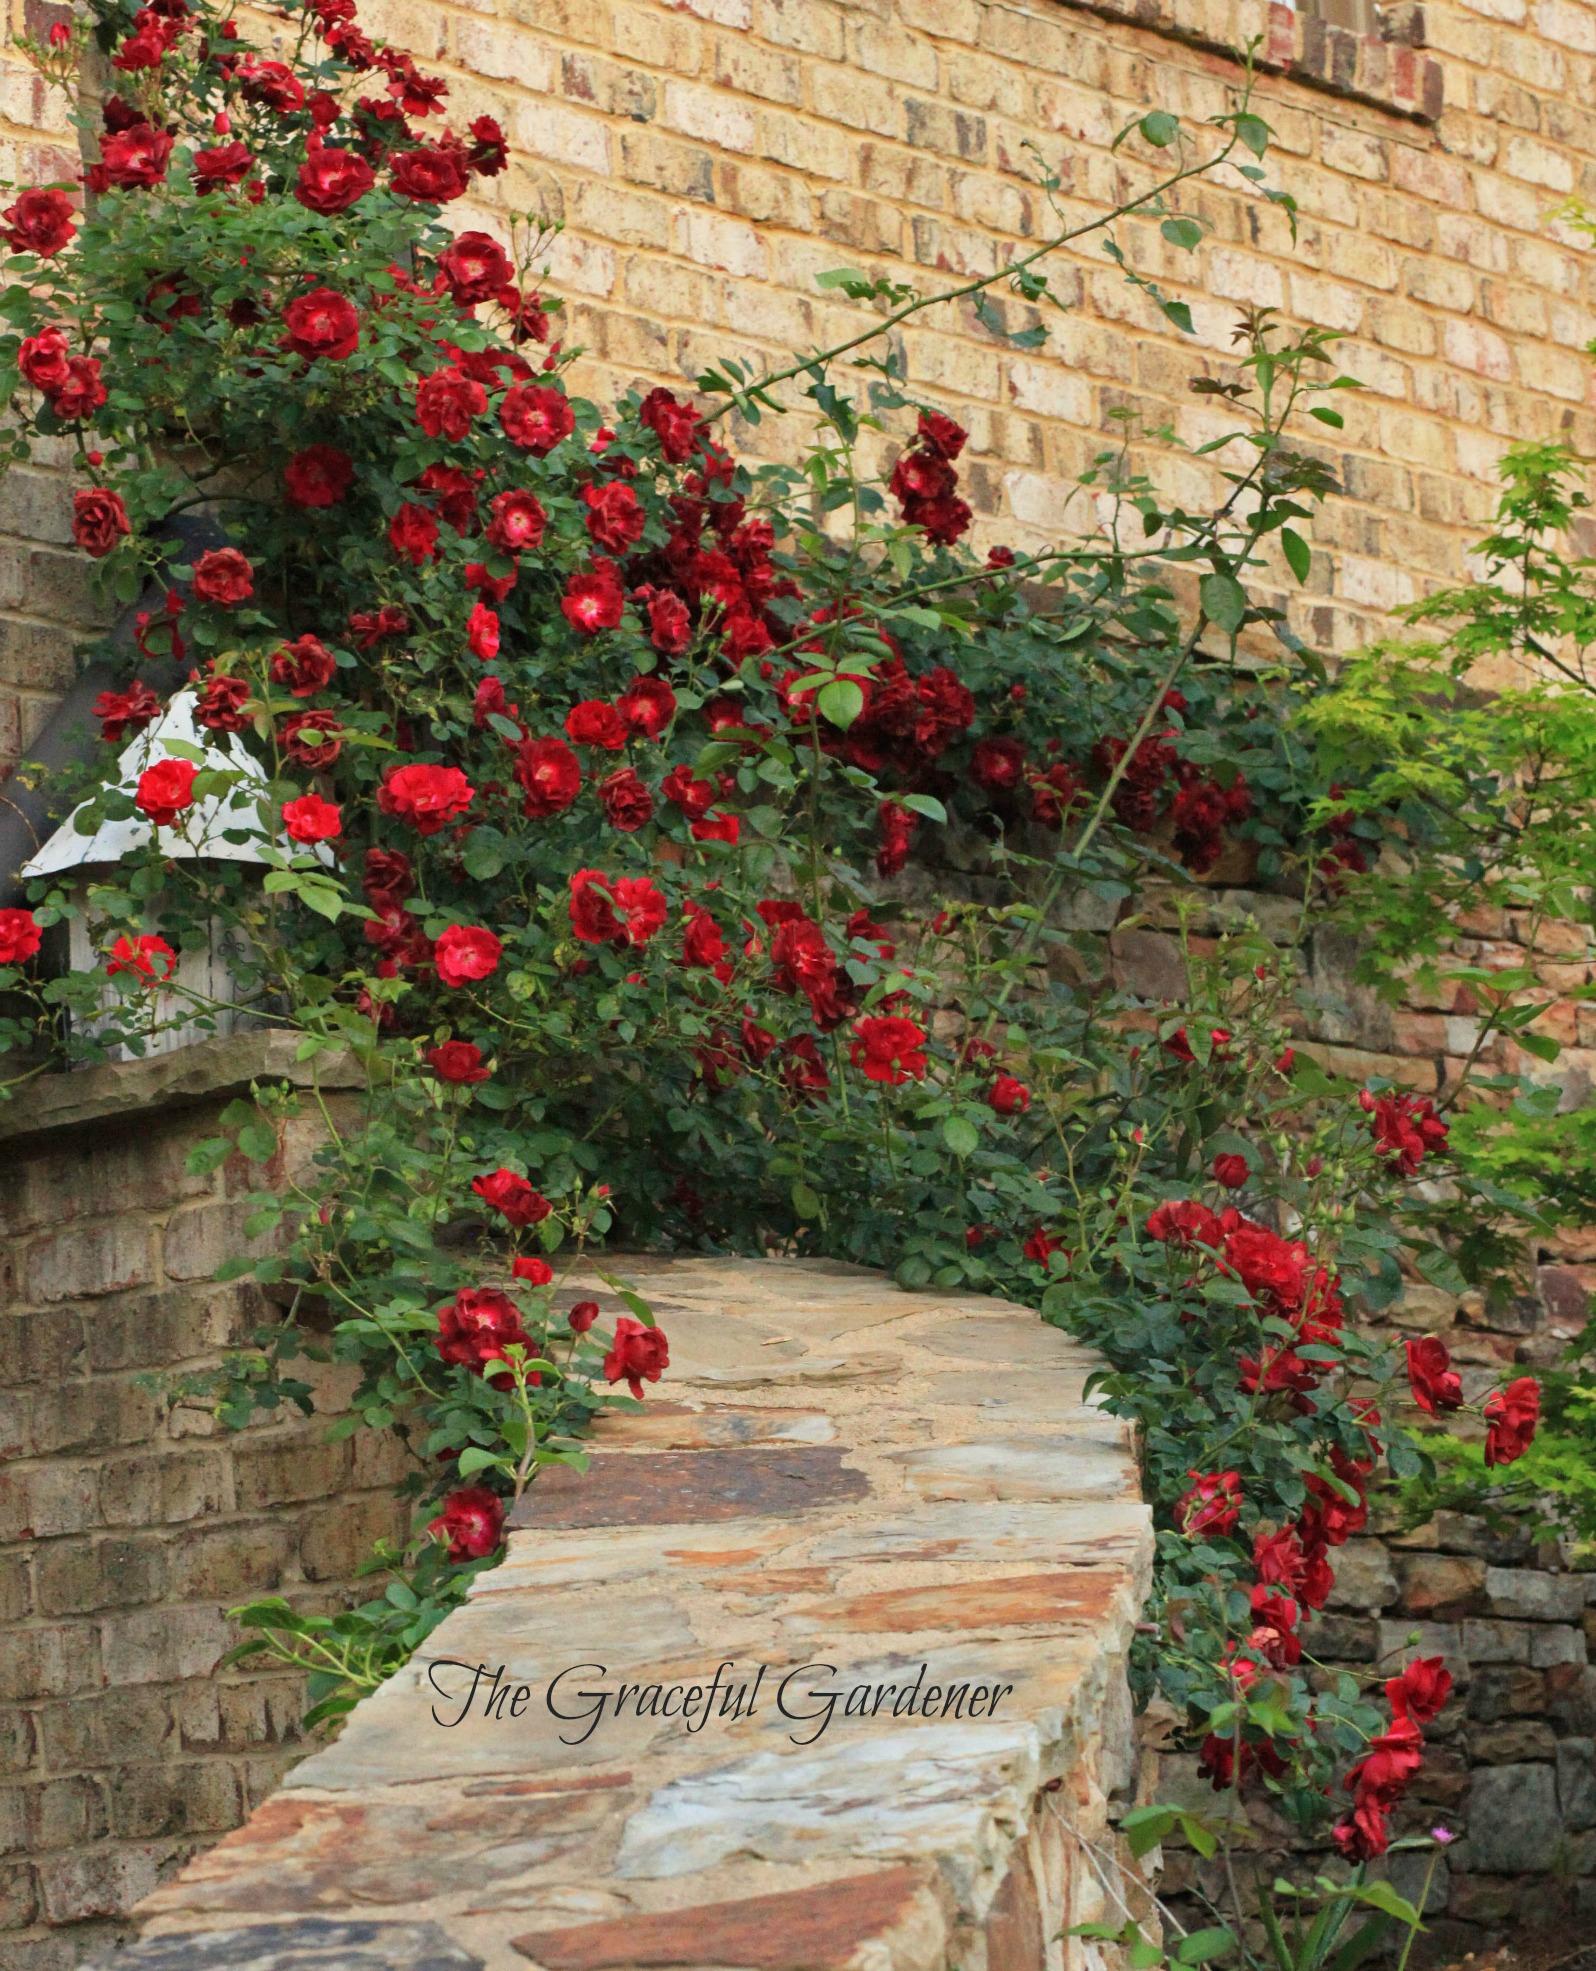 May 2013 – The Graceful Gardener